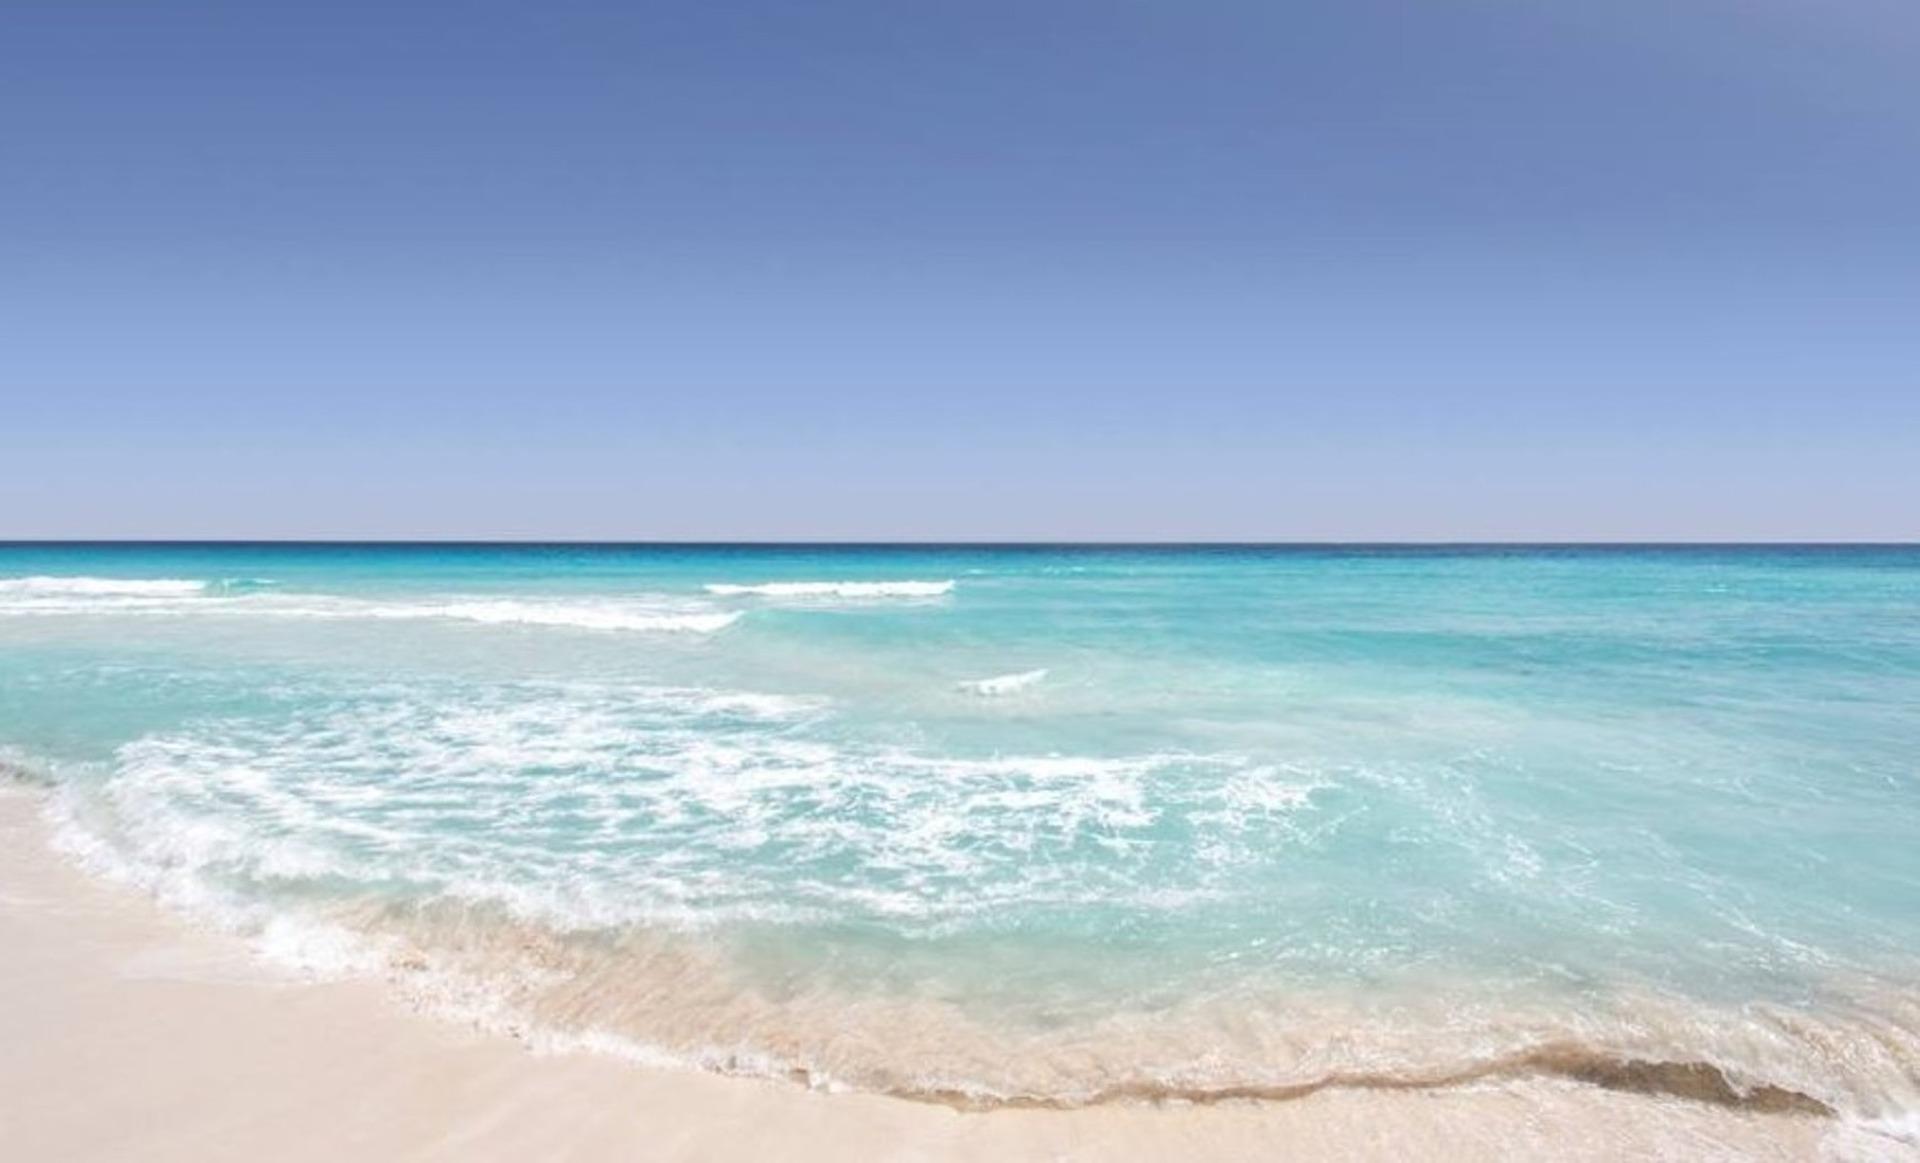 Mexico Tourism Board questions govt's Playa del Carmen update